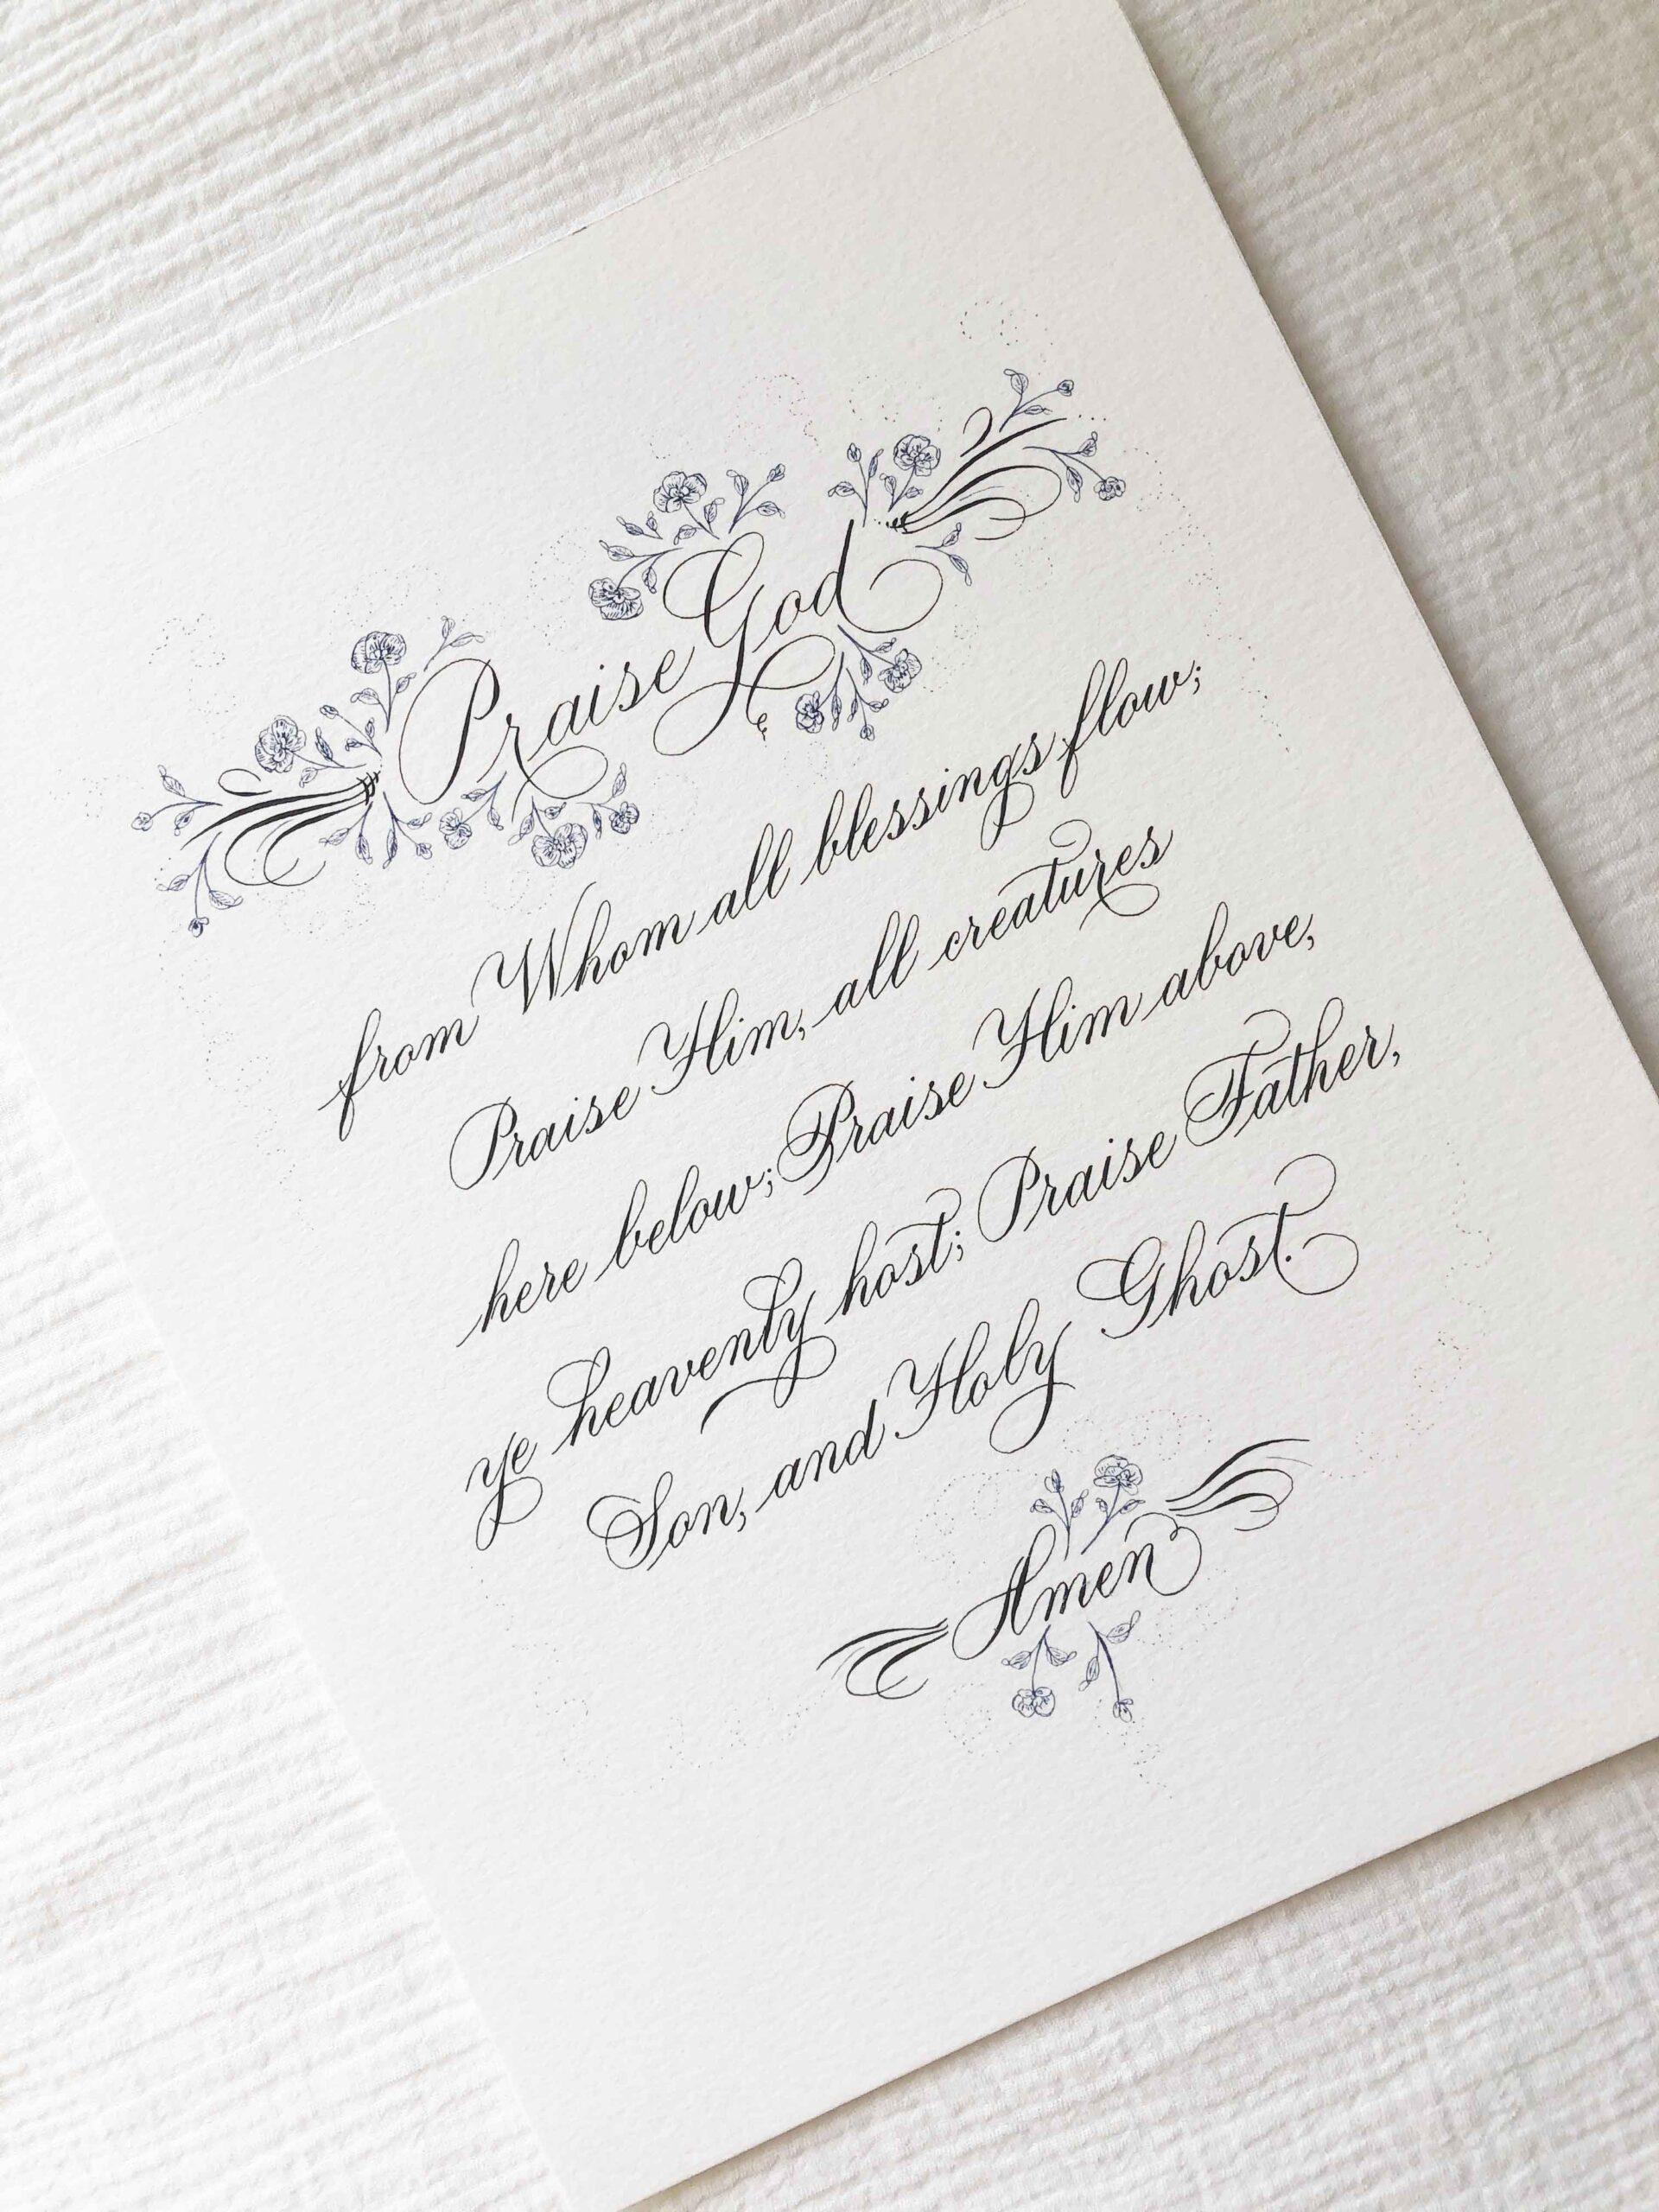 Allocco Design Norfolk, VA Calligraphy   Calligraphy Doxology